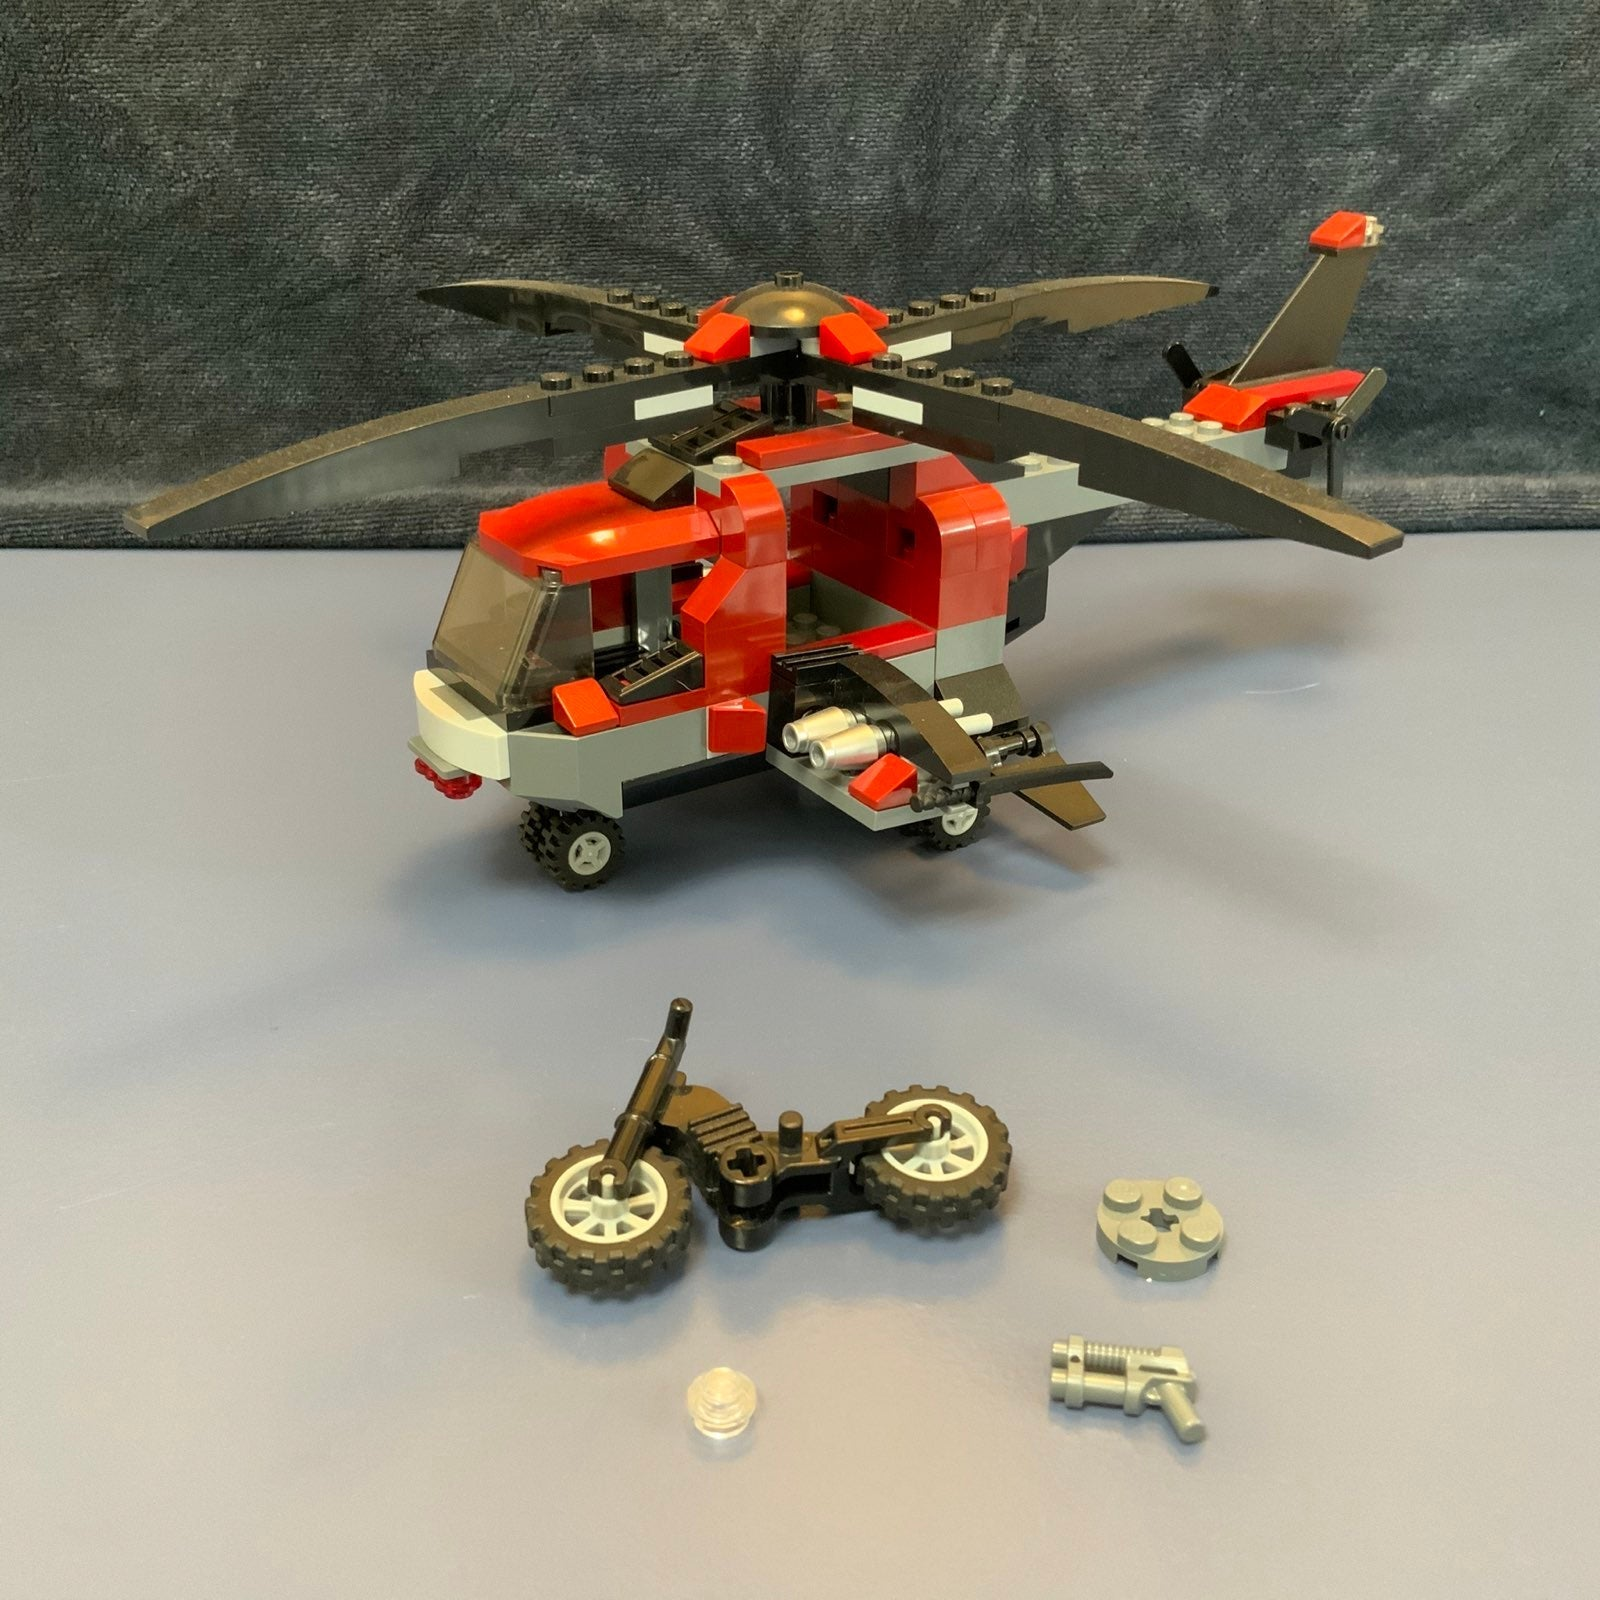 LEGO 6866 WOLVERINE'S CHOPPER SHOWDOWN -